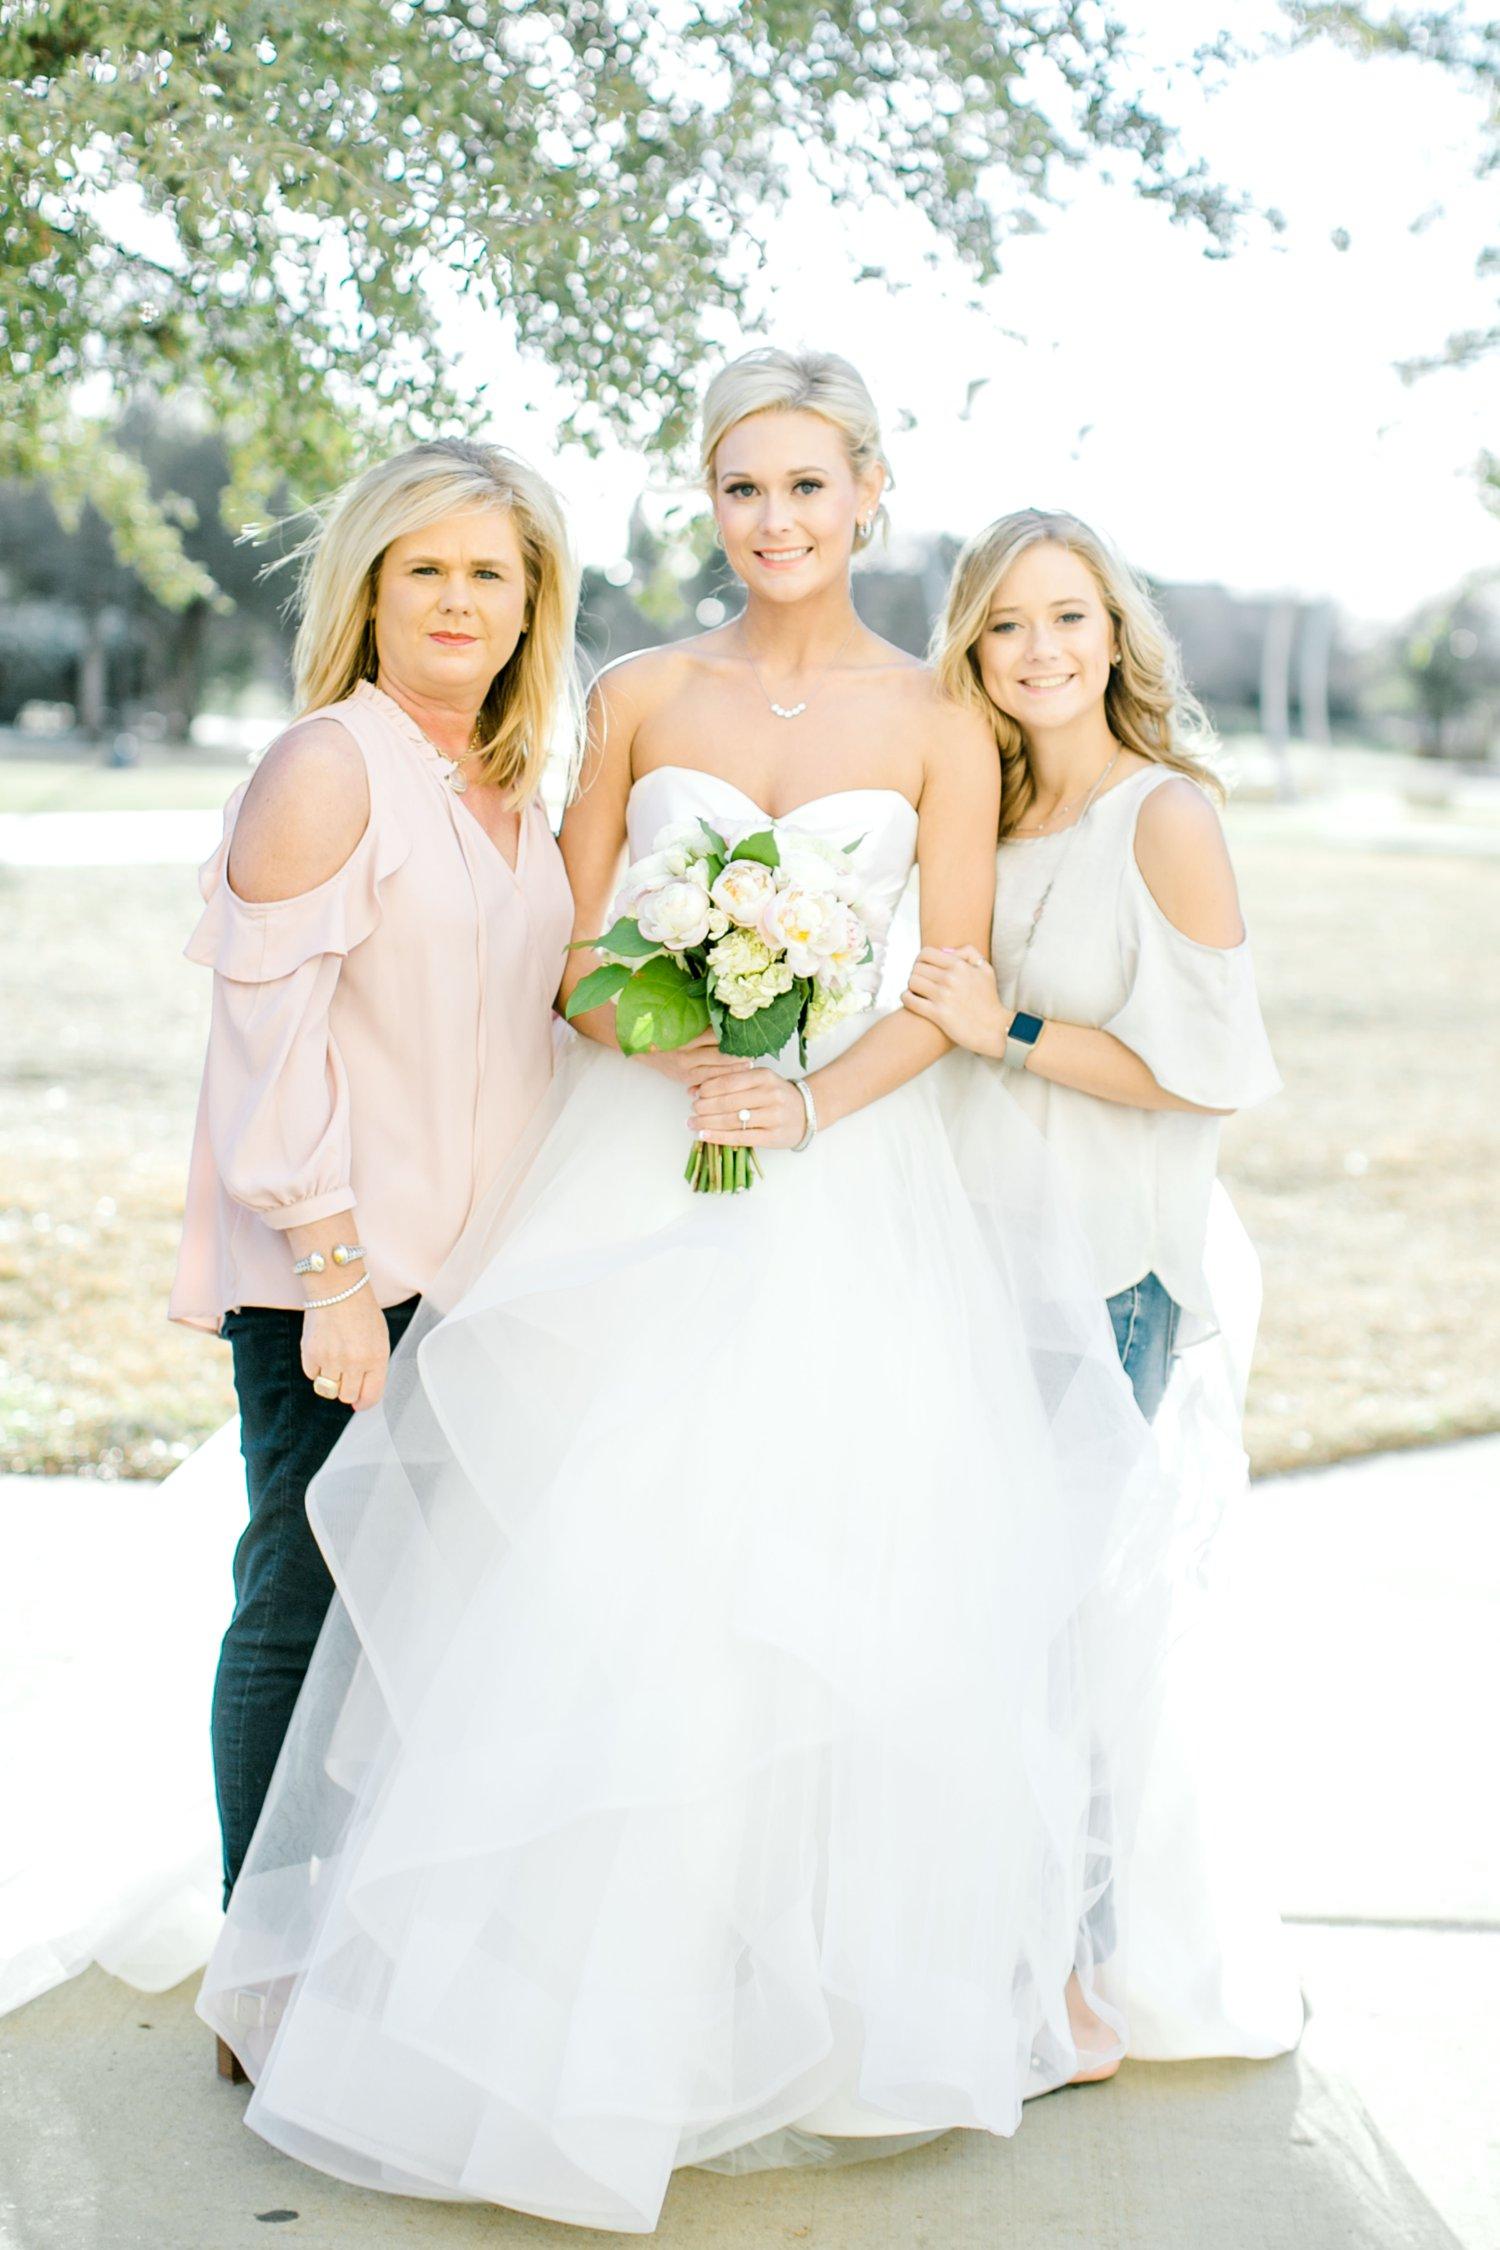 Taylor-Williams-Merket-Alumni-Center-Texas-Tech-Weddings-Lubbock-Photographer_0049.jpg